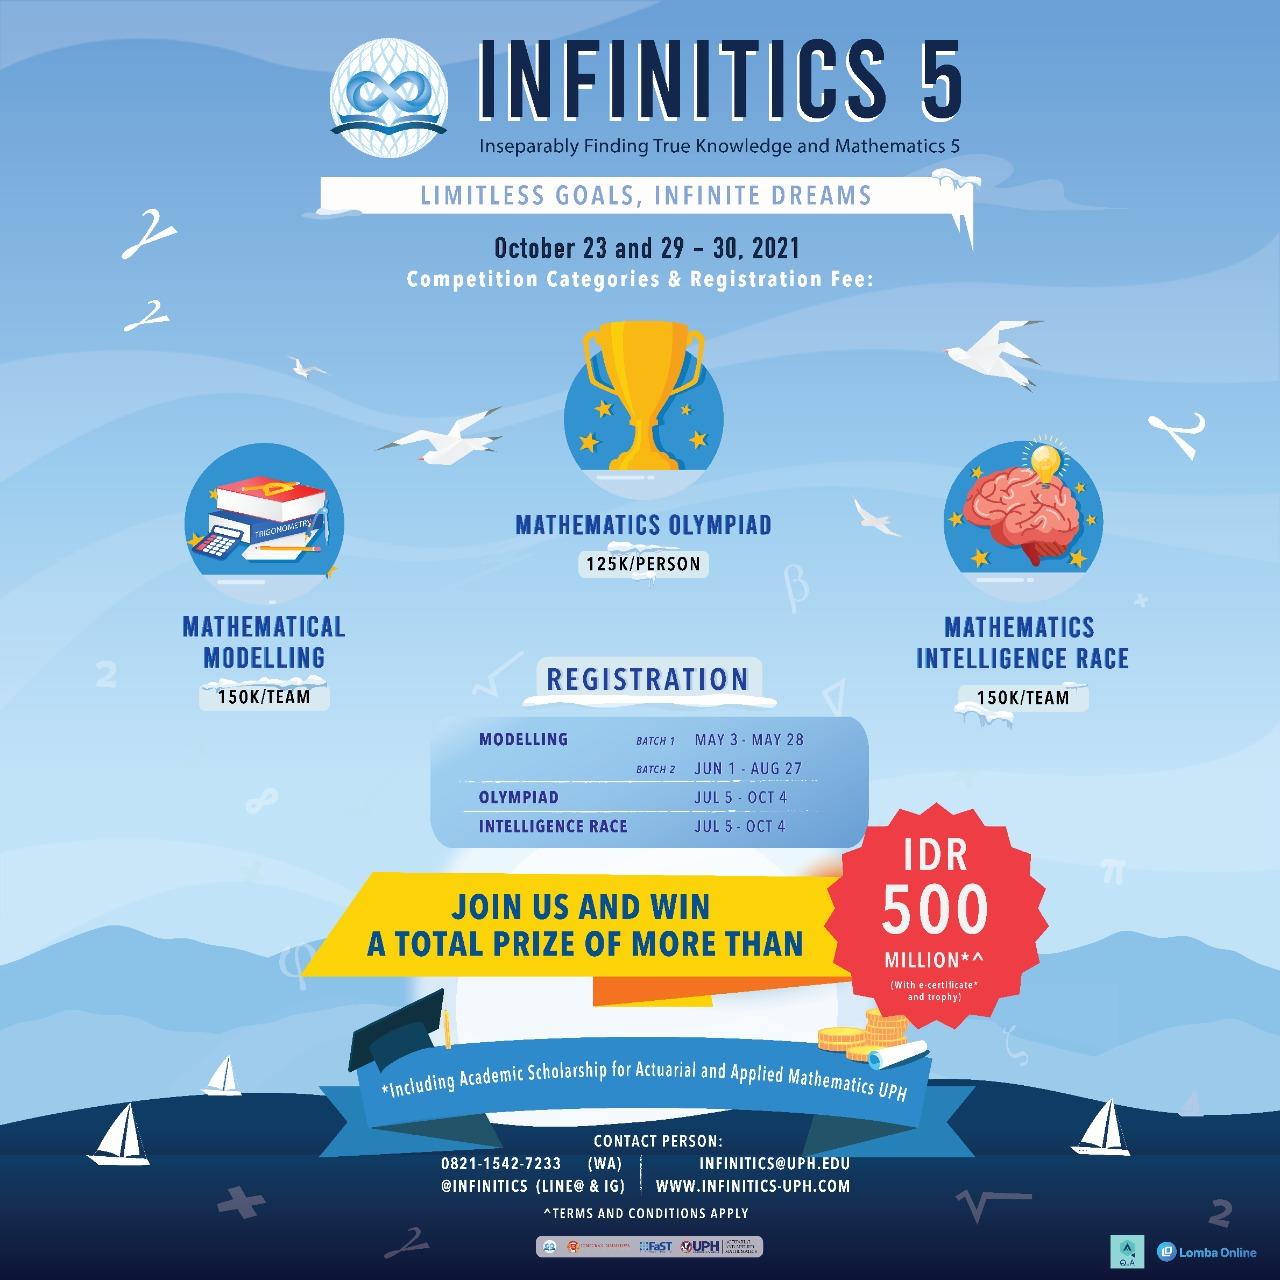 INFINITICS 5: Limitless Goals, Infinite Dreams